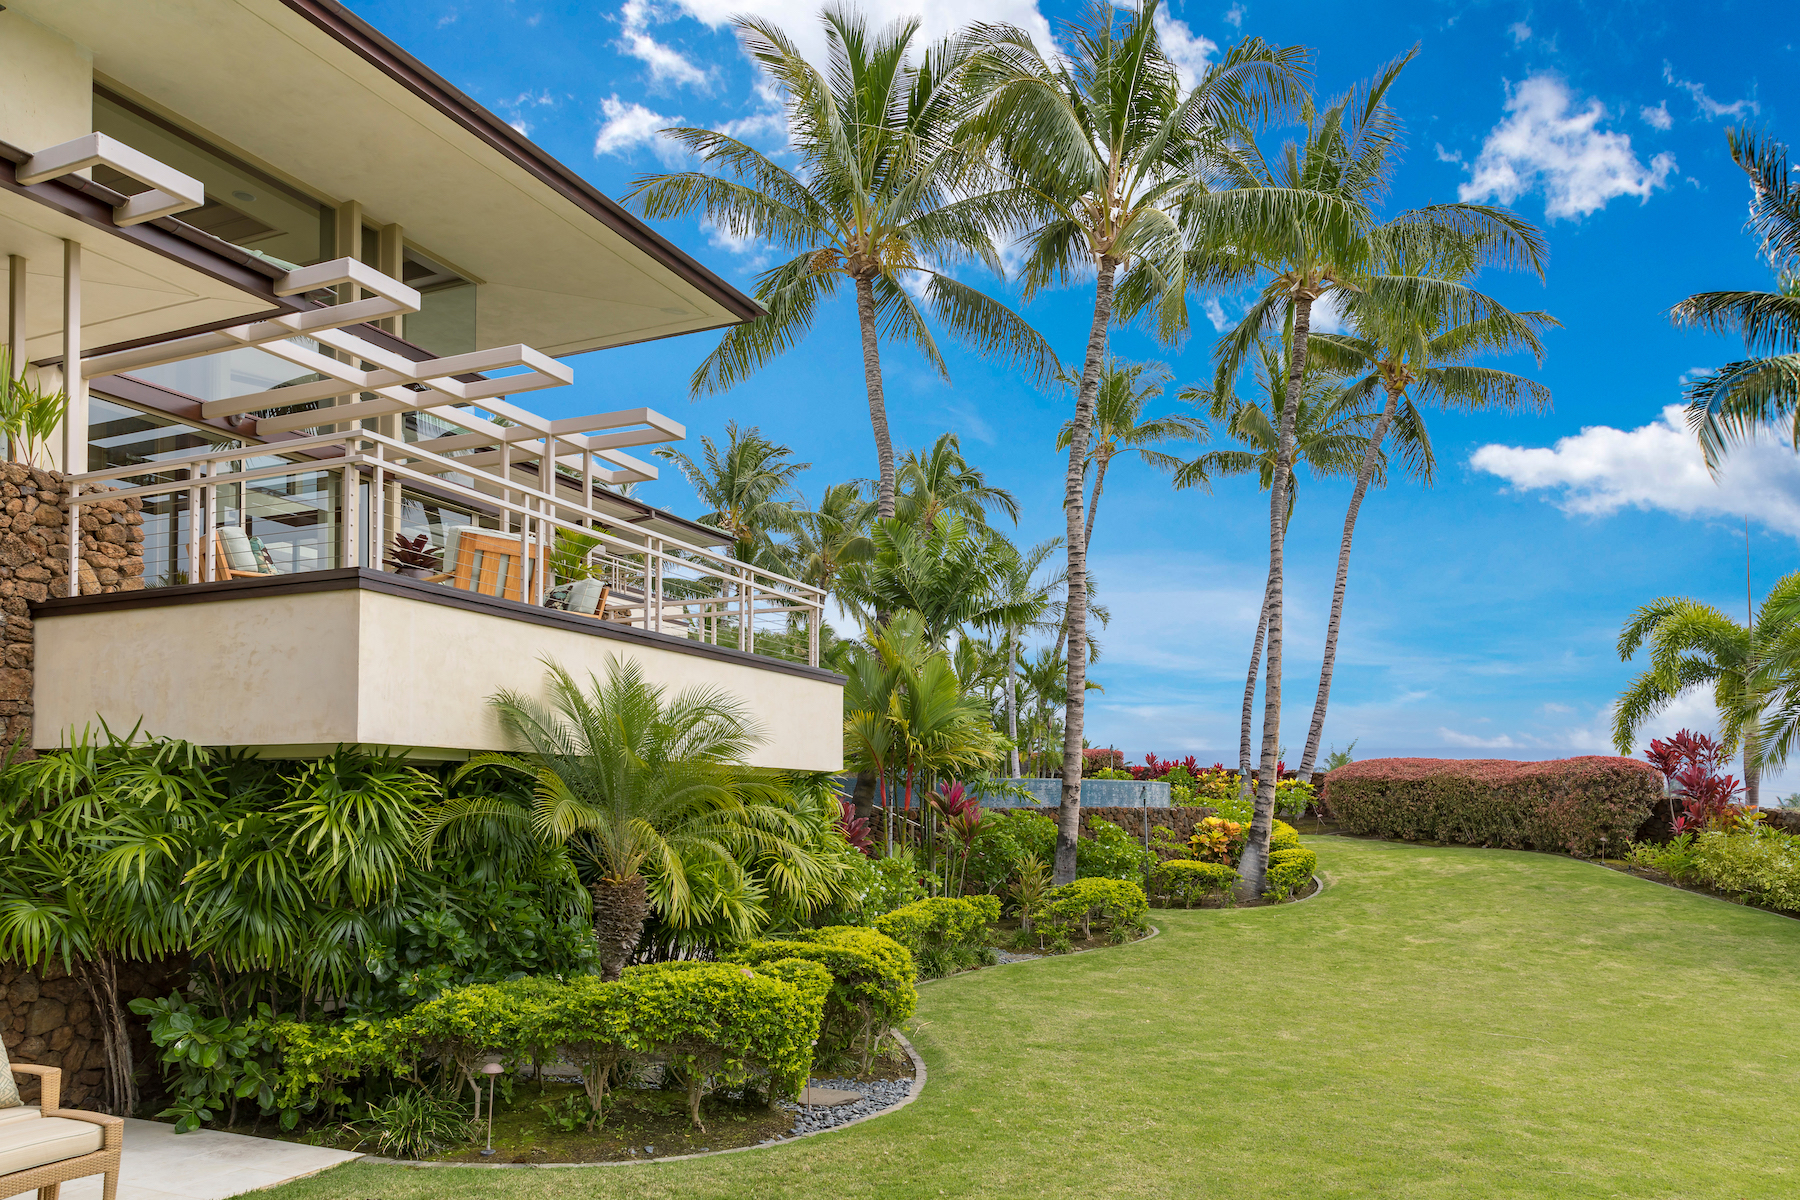 Single Family Homes for Active at LIVE at The Bluffs at Mauna Kea 62-3692 Ki'Eki'Ena Pl Kamuela, Hawaii 96743 United States